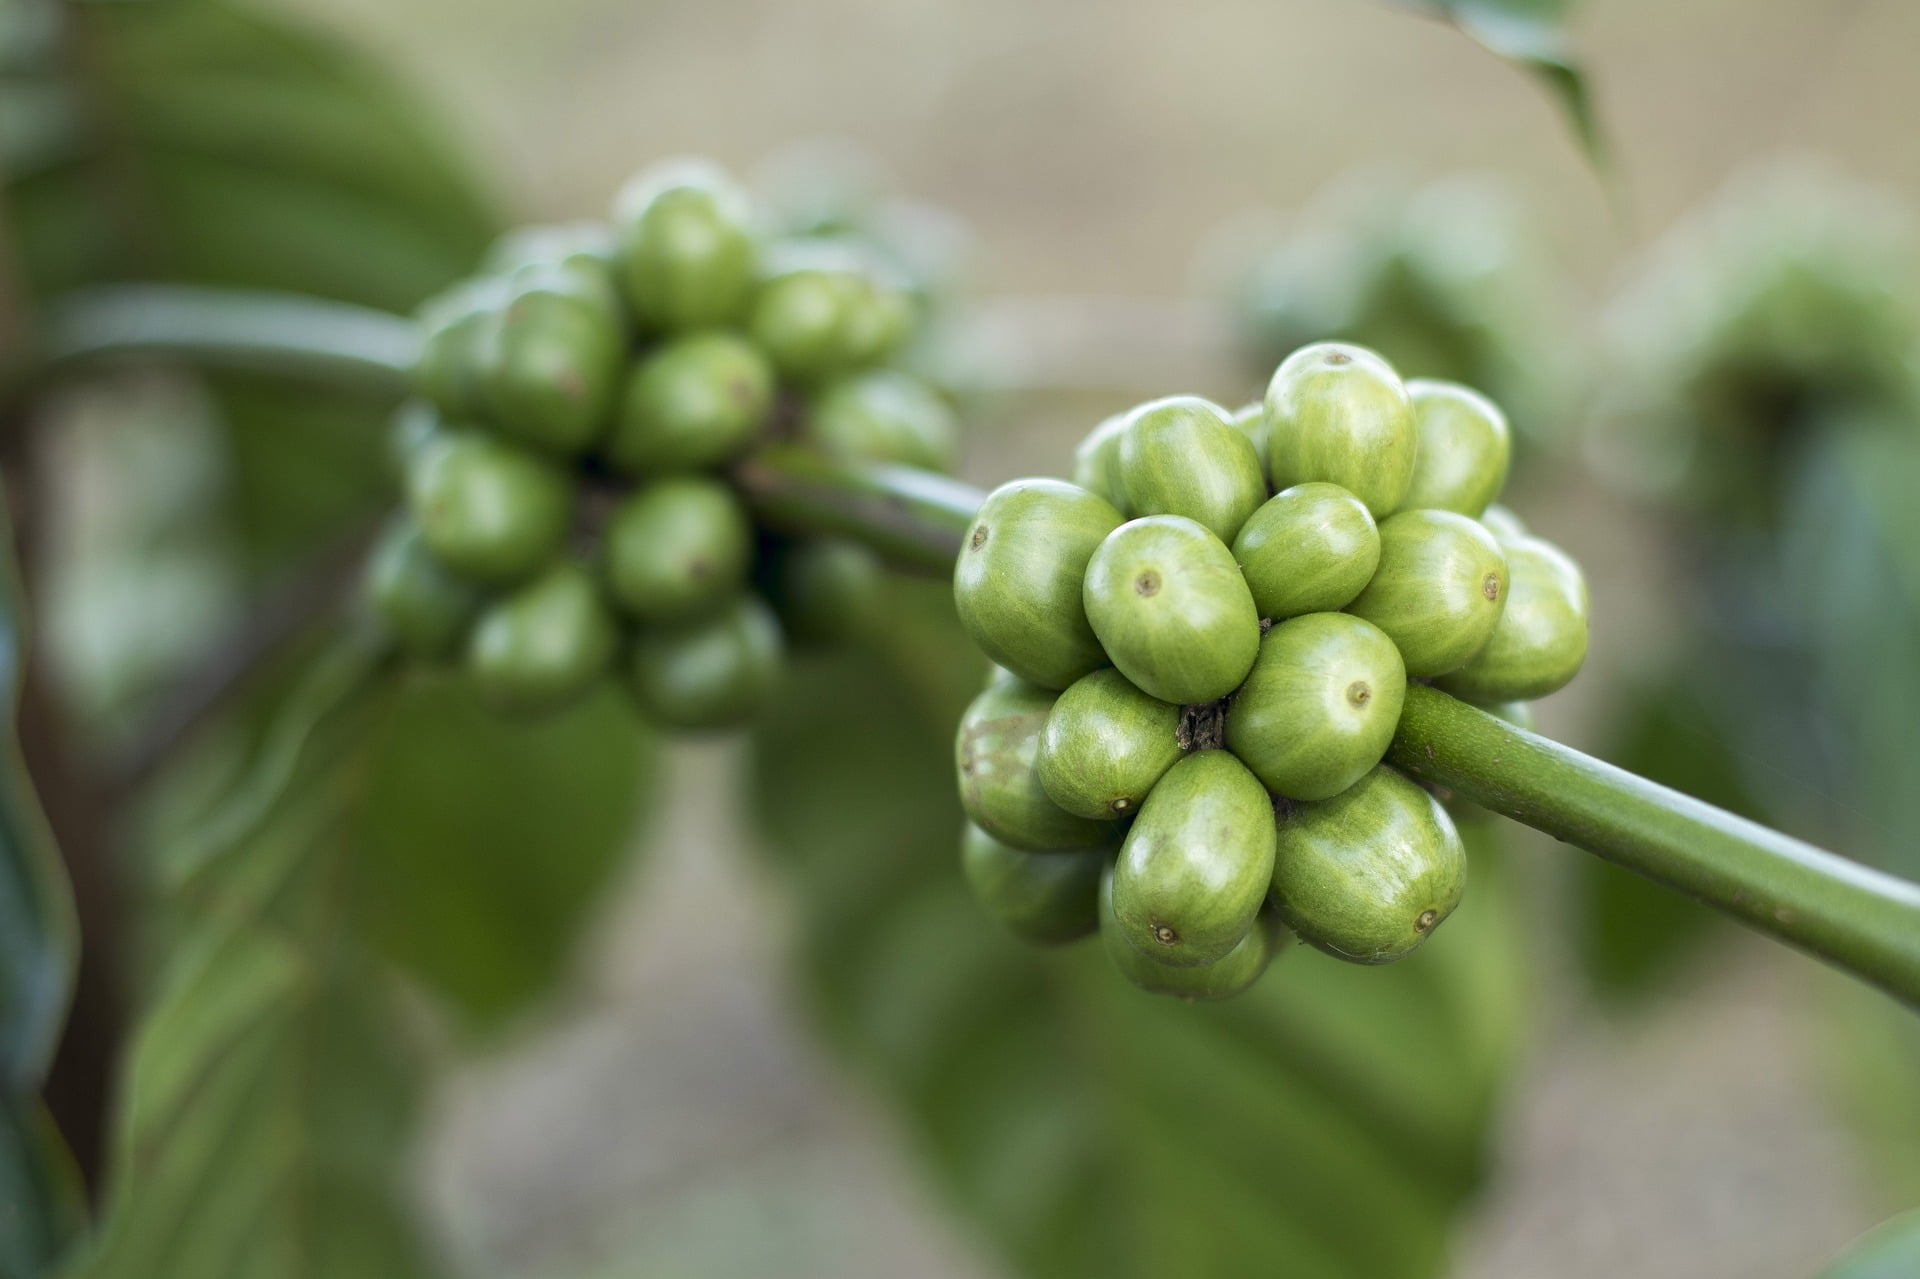 grüner Kaffe extrakt kapseln Wirkung